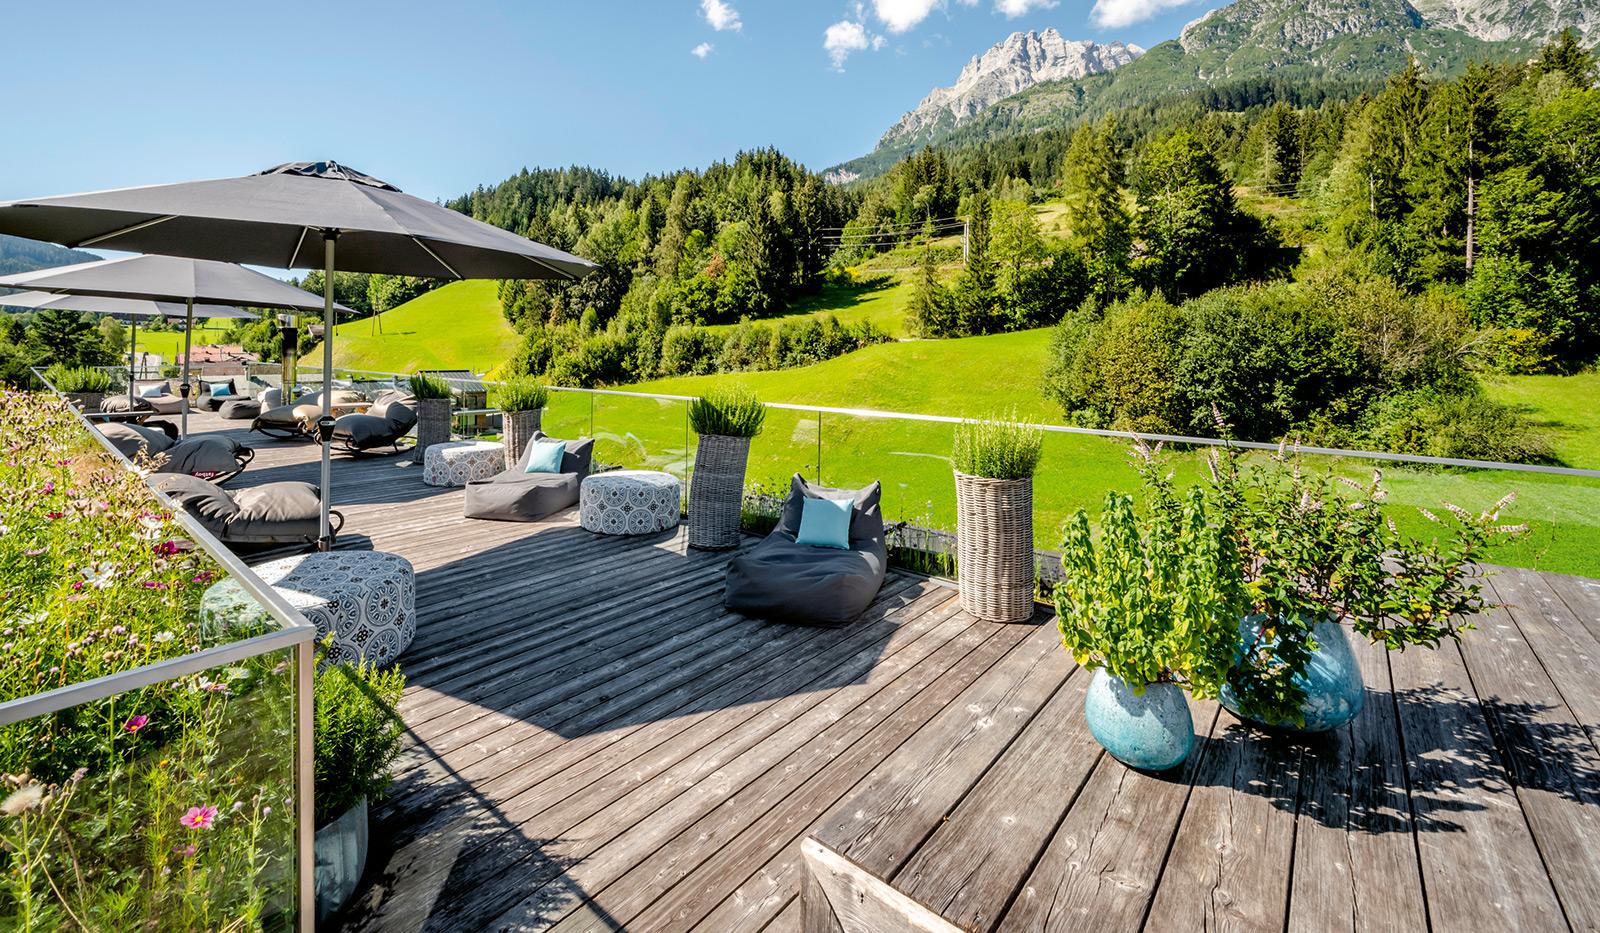 thresl guenterstandl.de  - mama thresl – Urban Soul meets the Alps